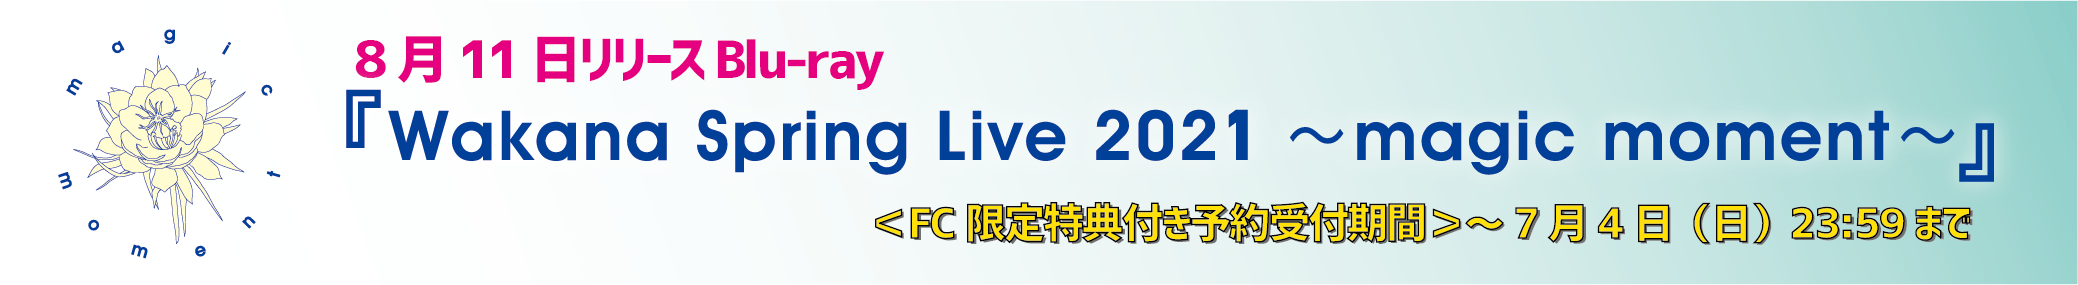 Blu-ray『Wakana Spring Live ~magic moment~ 2021』